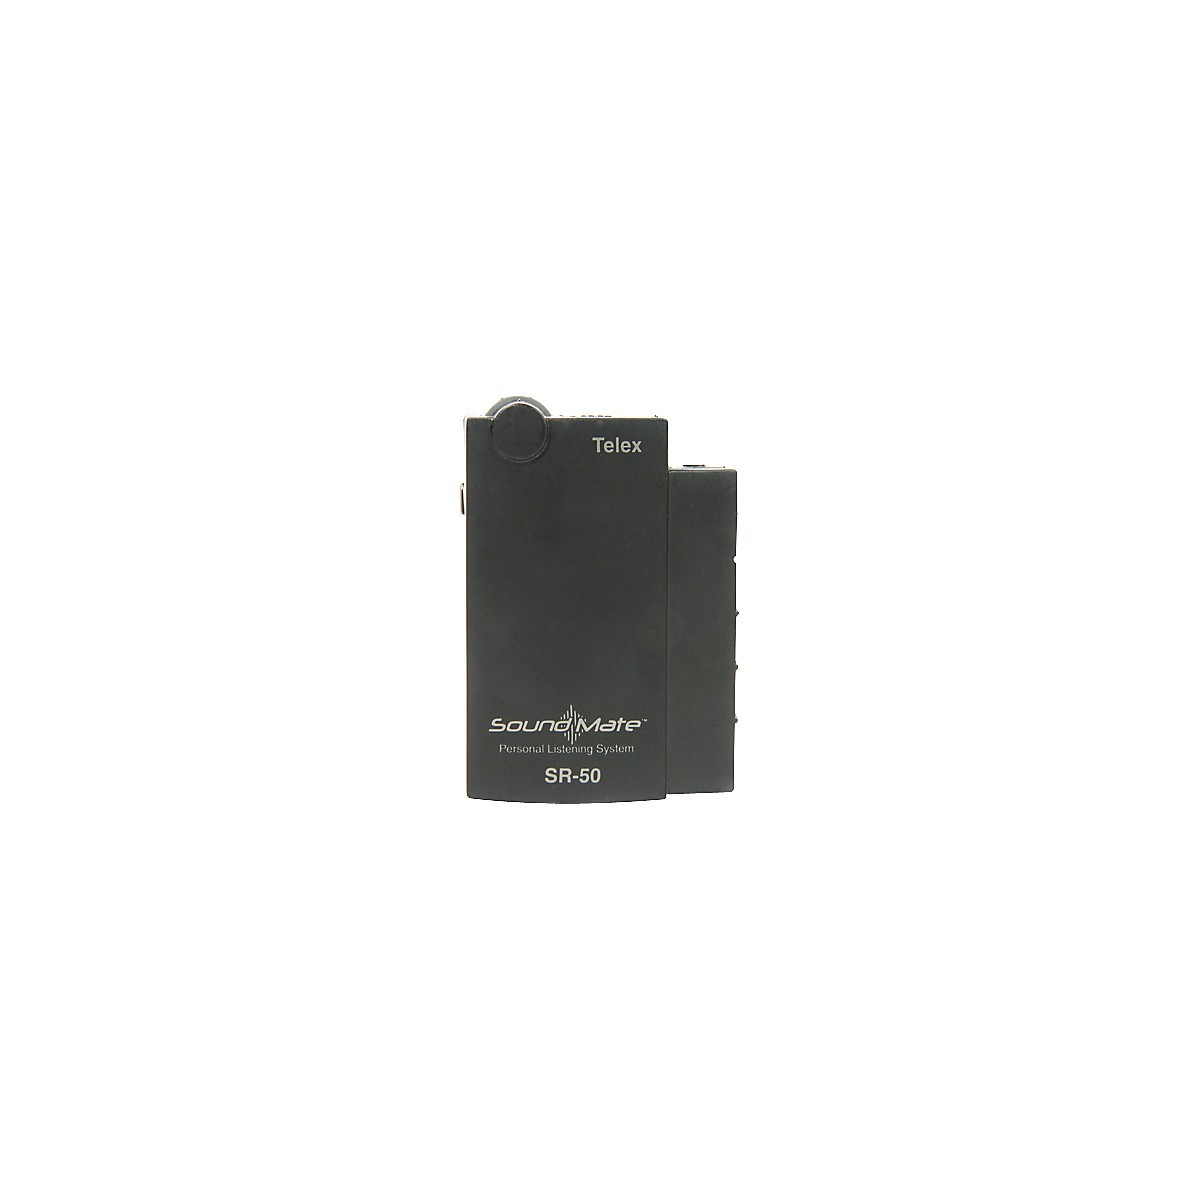 Telex SoundMate SR-50 ALD Receiver Channel A